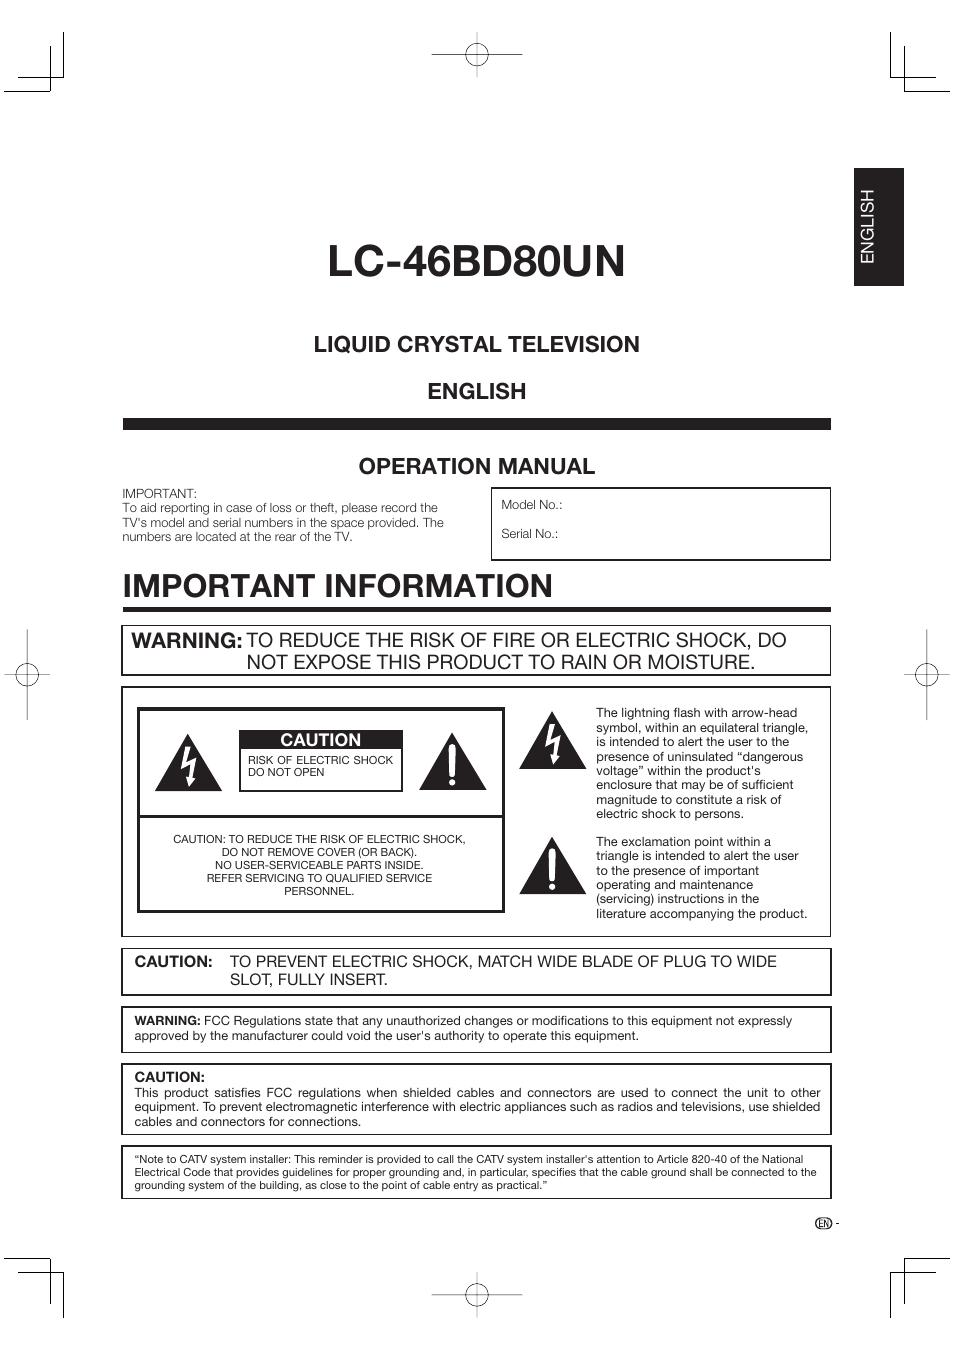 important information lc 46bd80un operation manual sharp aquos rh manualsdir com sharp user manual mx-m465 sharp user manual mx-m465